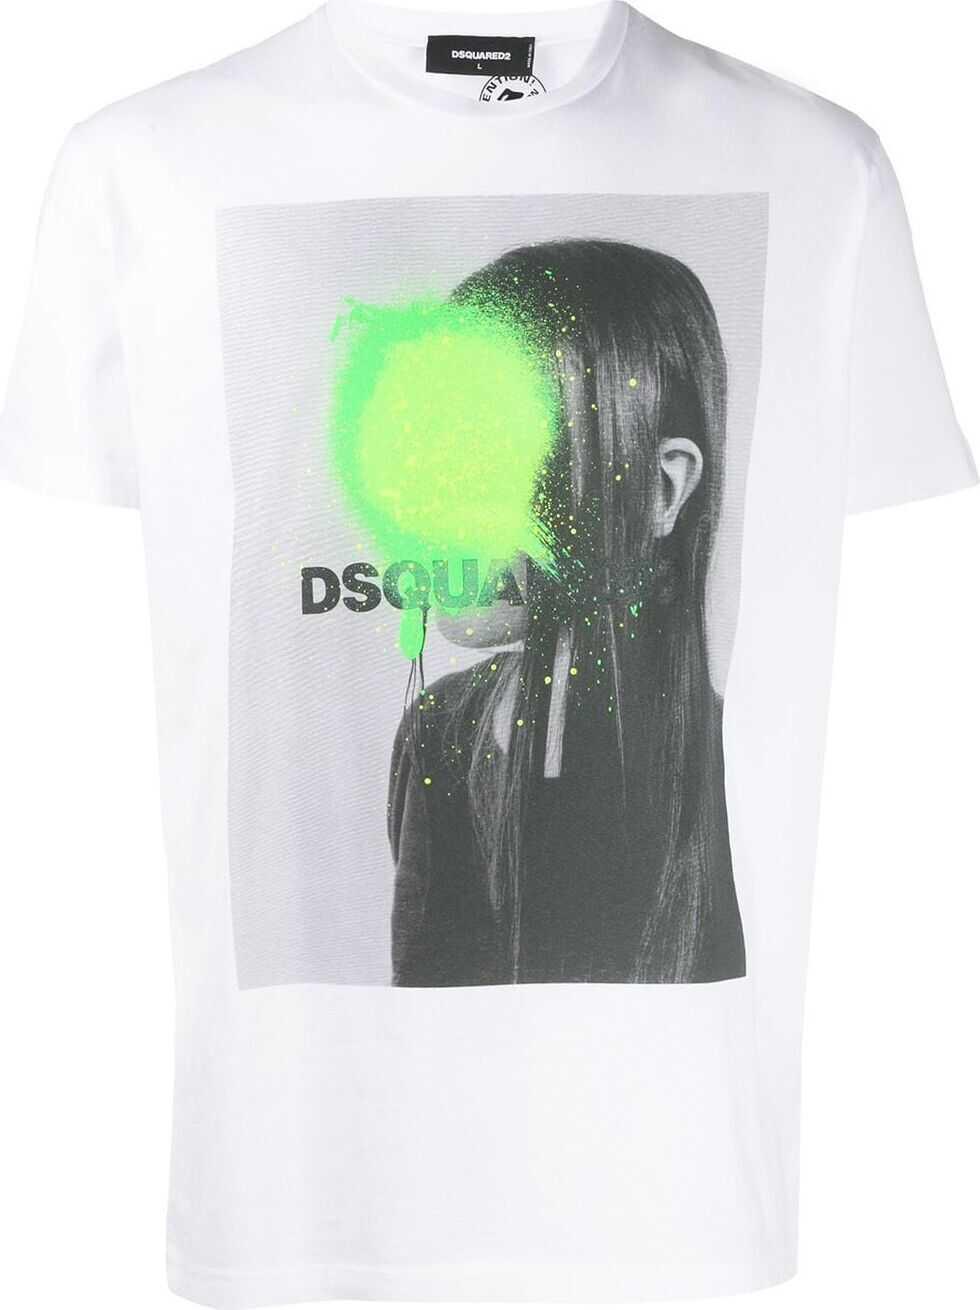 DSQUARED2 Cotton T-Shirt WHITE